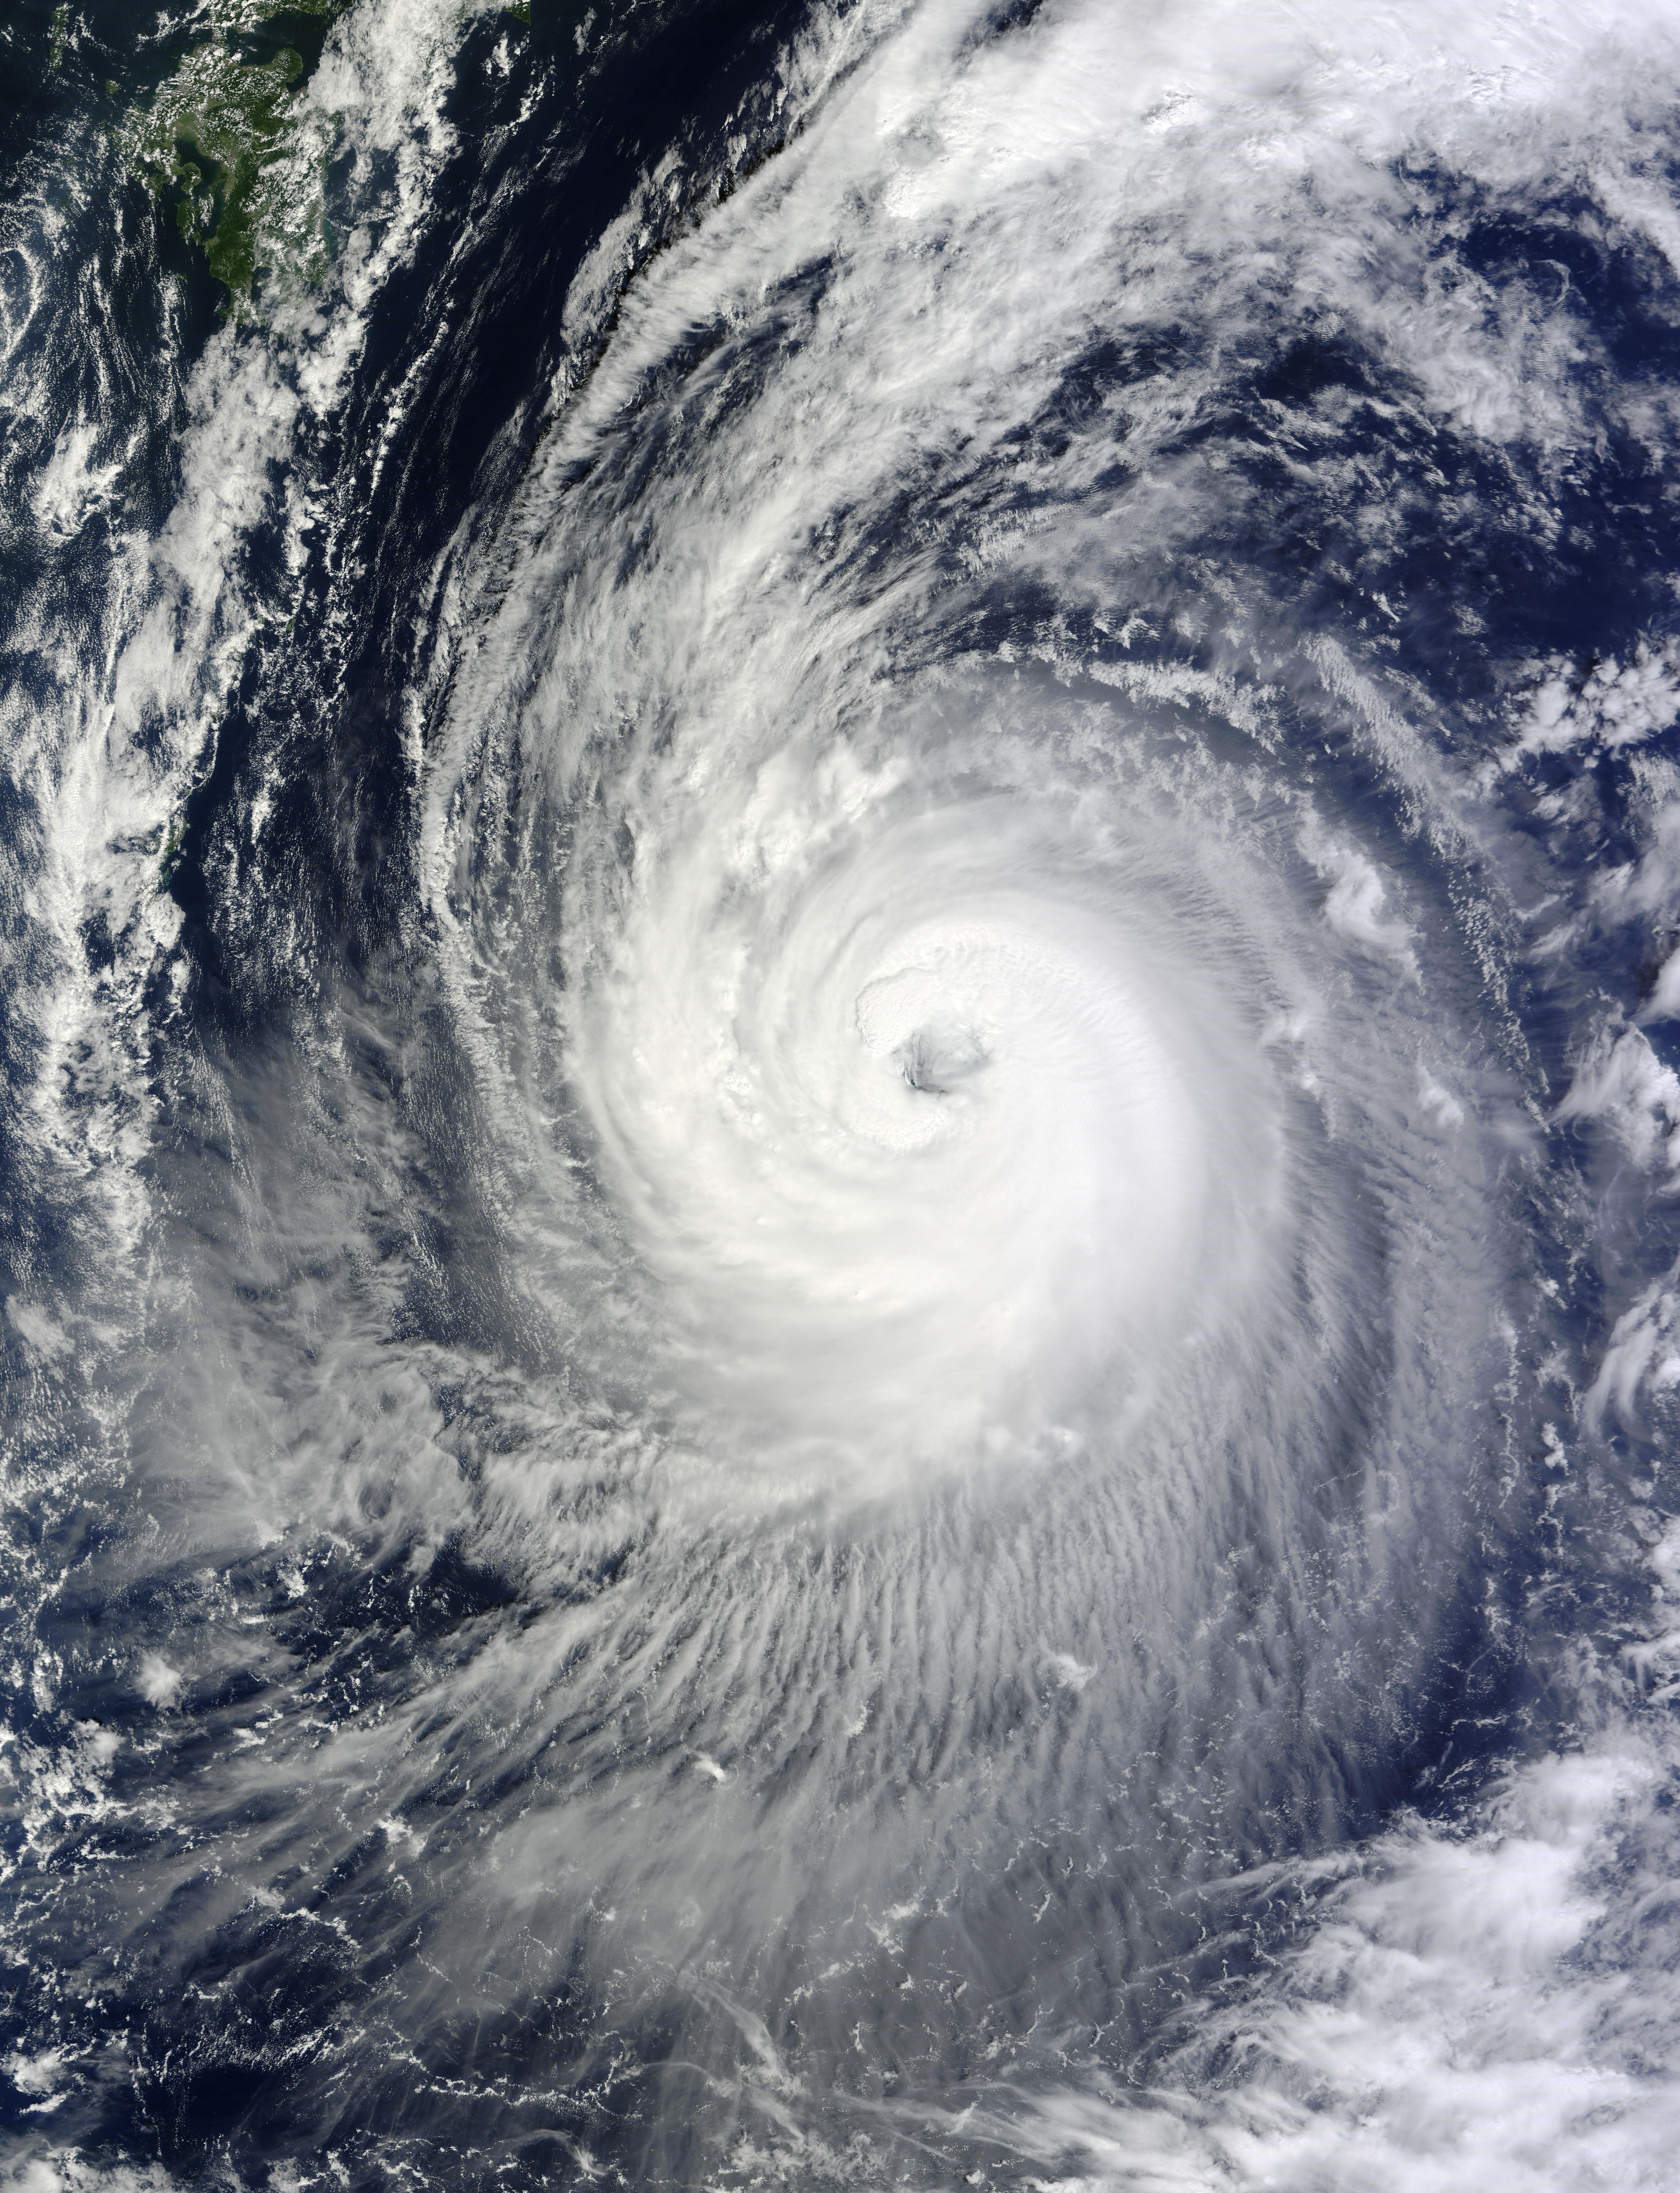 tajfun(210x140).jpg (Array)